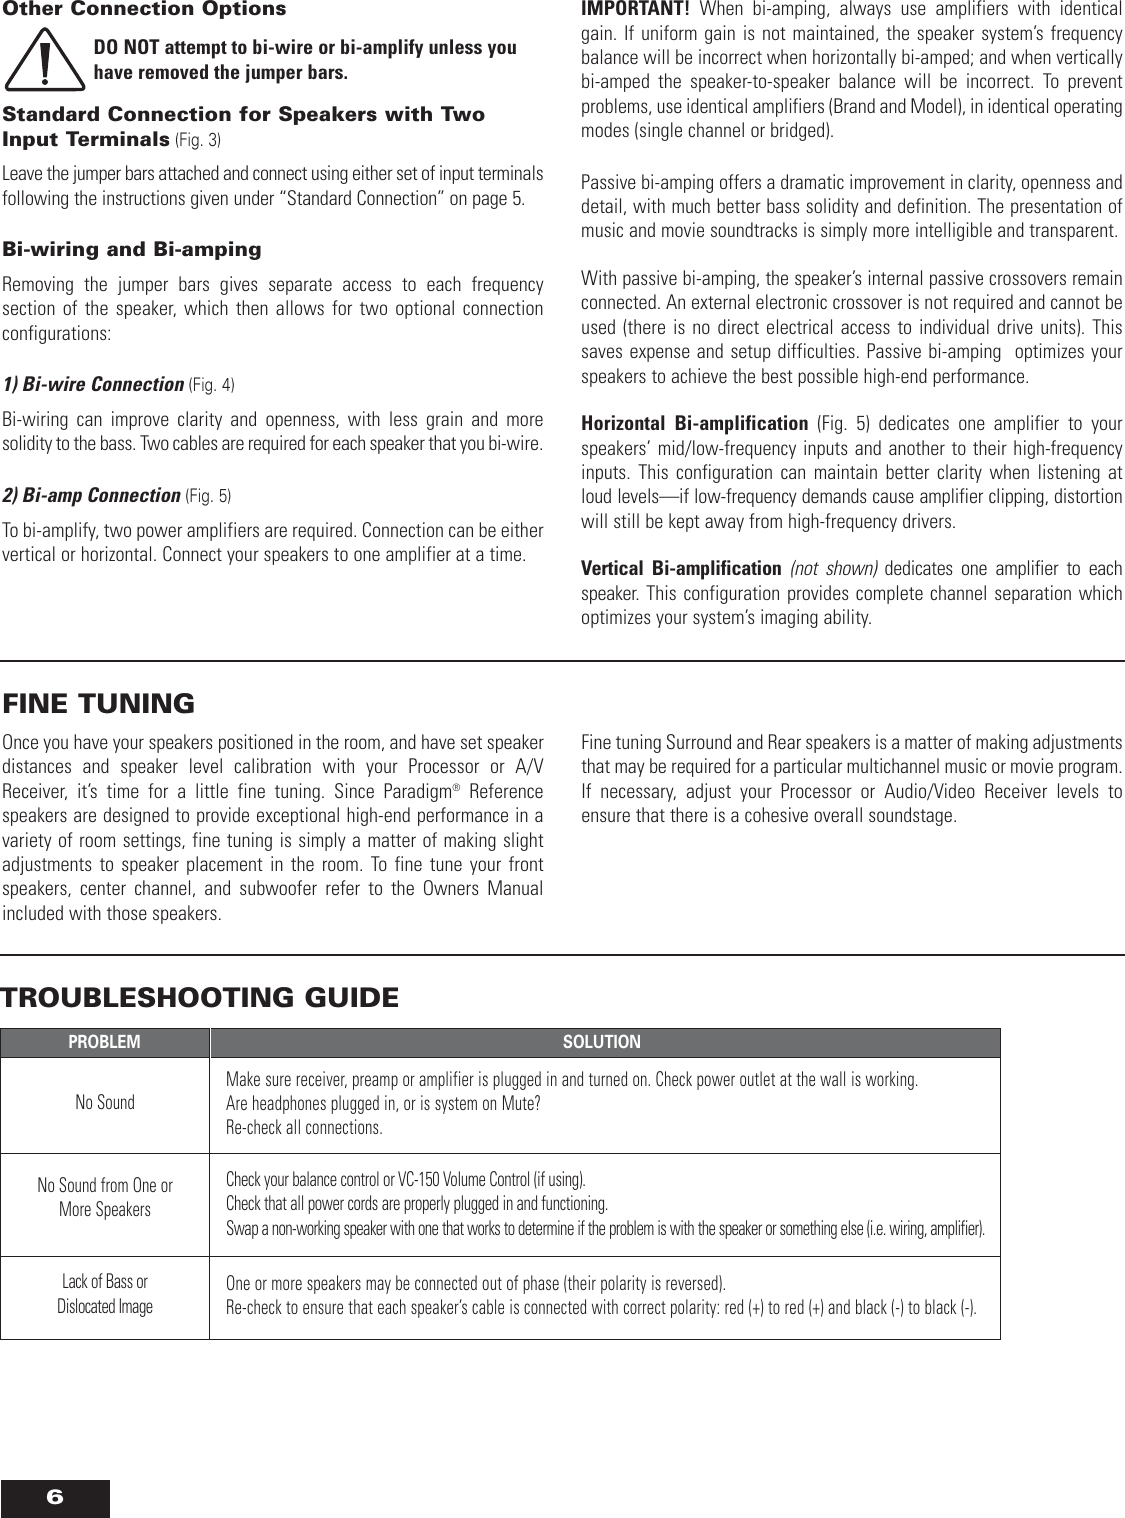 Paradigm Speaker Om 560 Users Manual 560_Online_060607